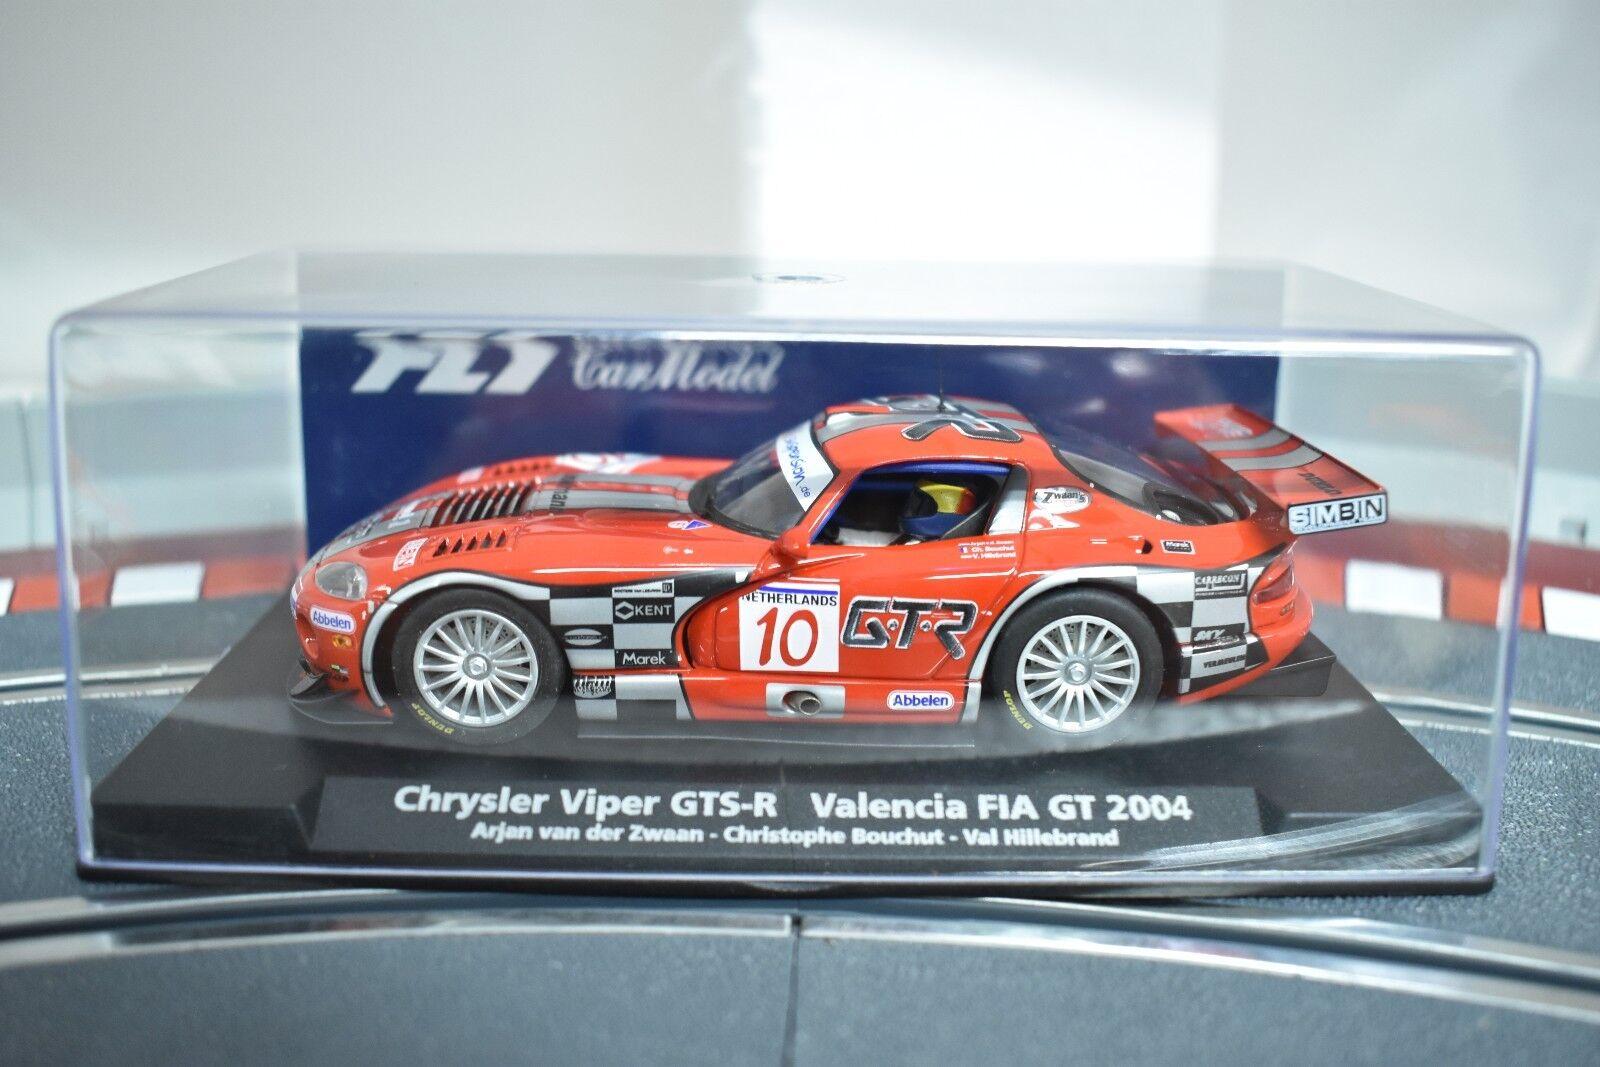 88109 FLY CAR MODEL 1 32 SLOT CAR CHRYLER VIPER GTS-R VALENCIA FIA GT 2004